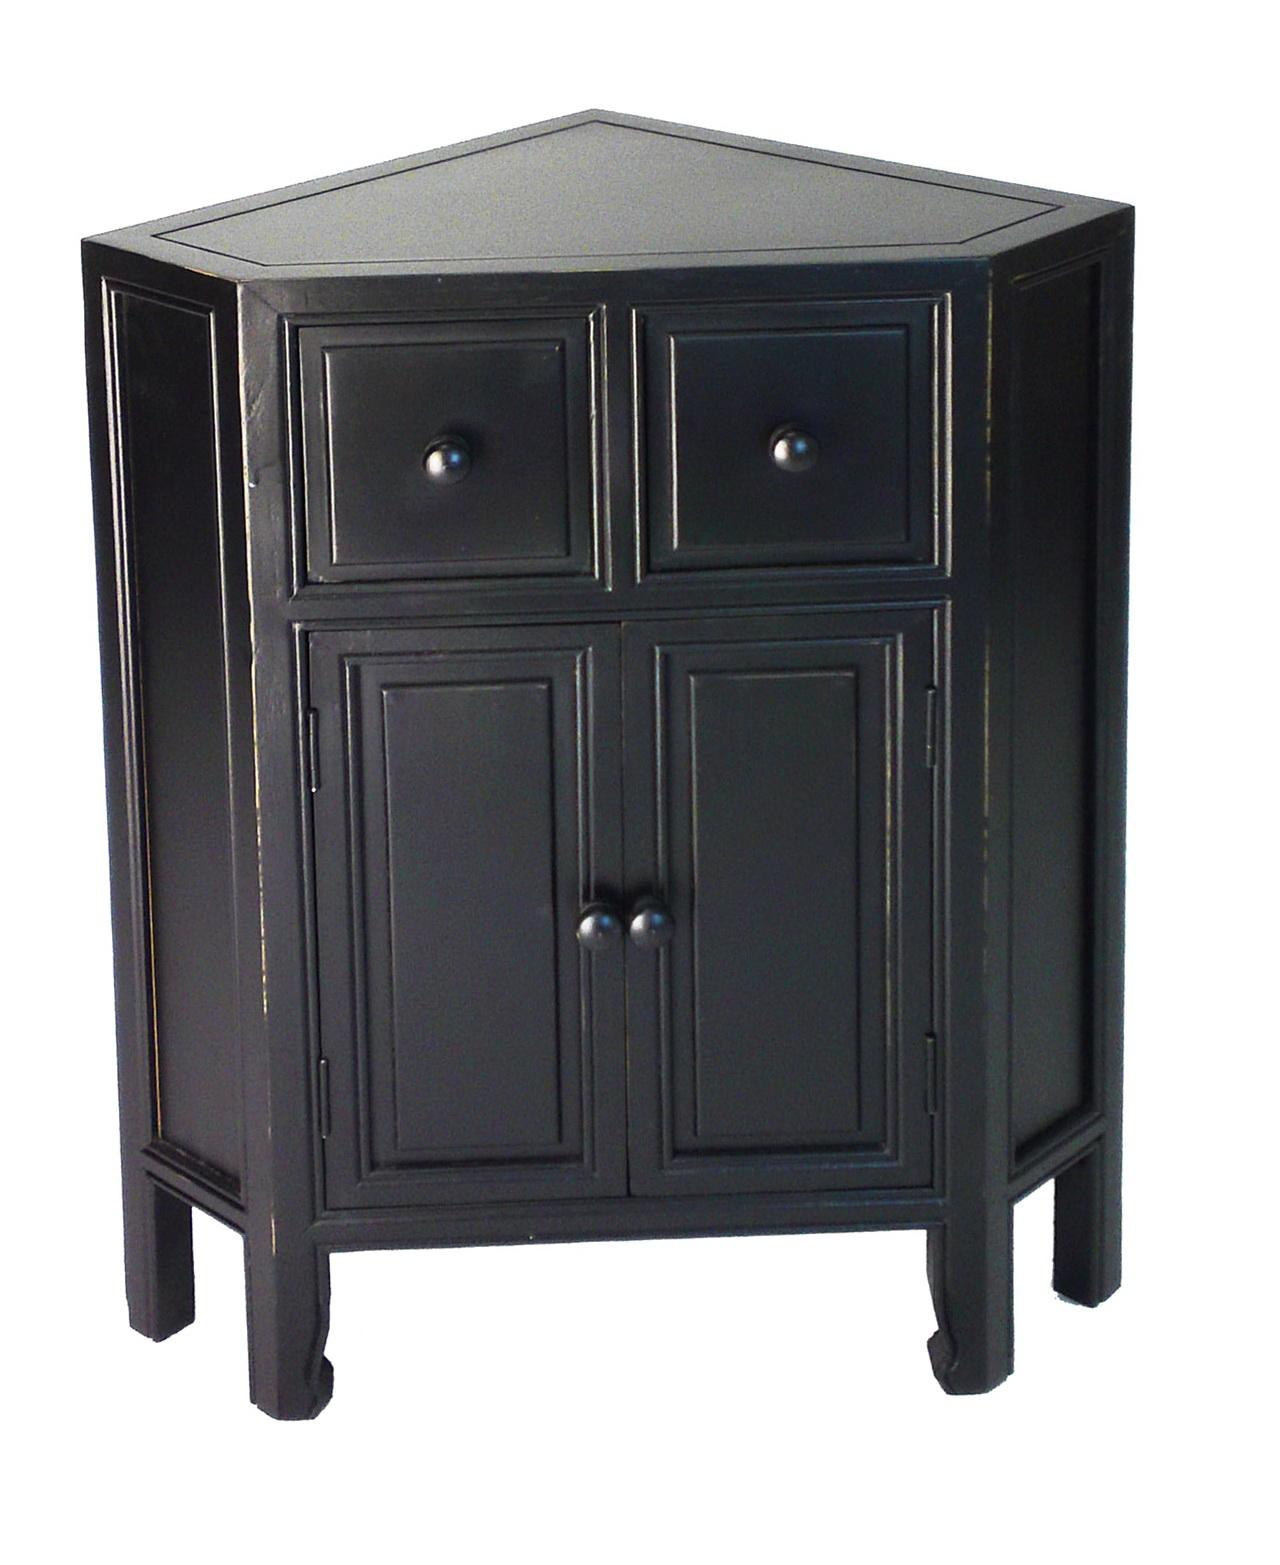 Black Corner Storage Cabinet